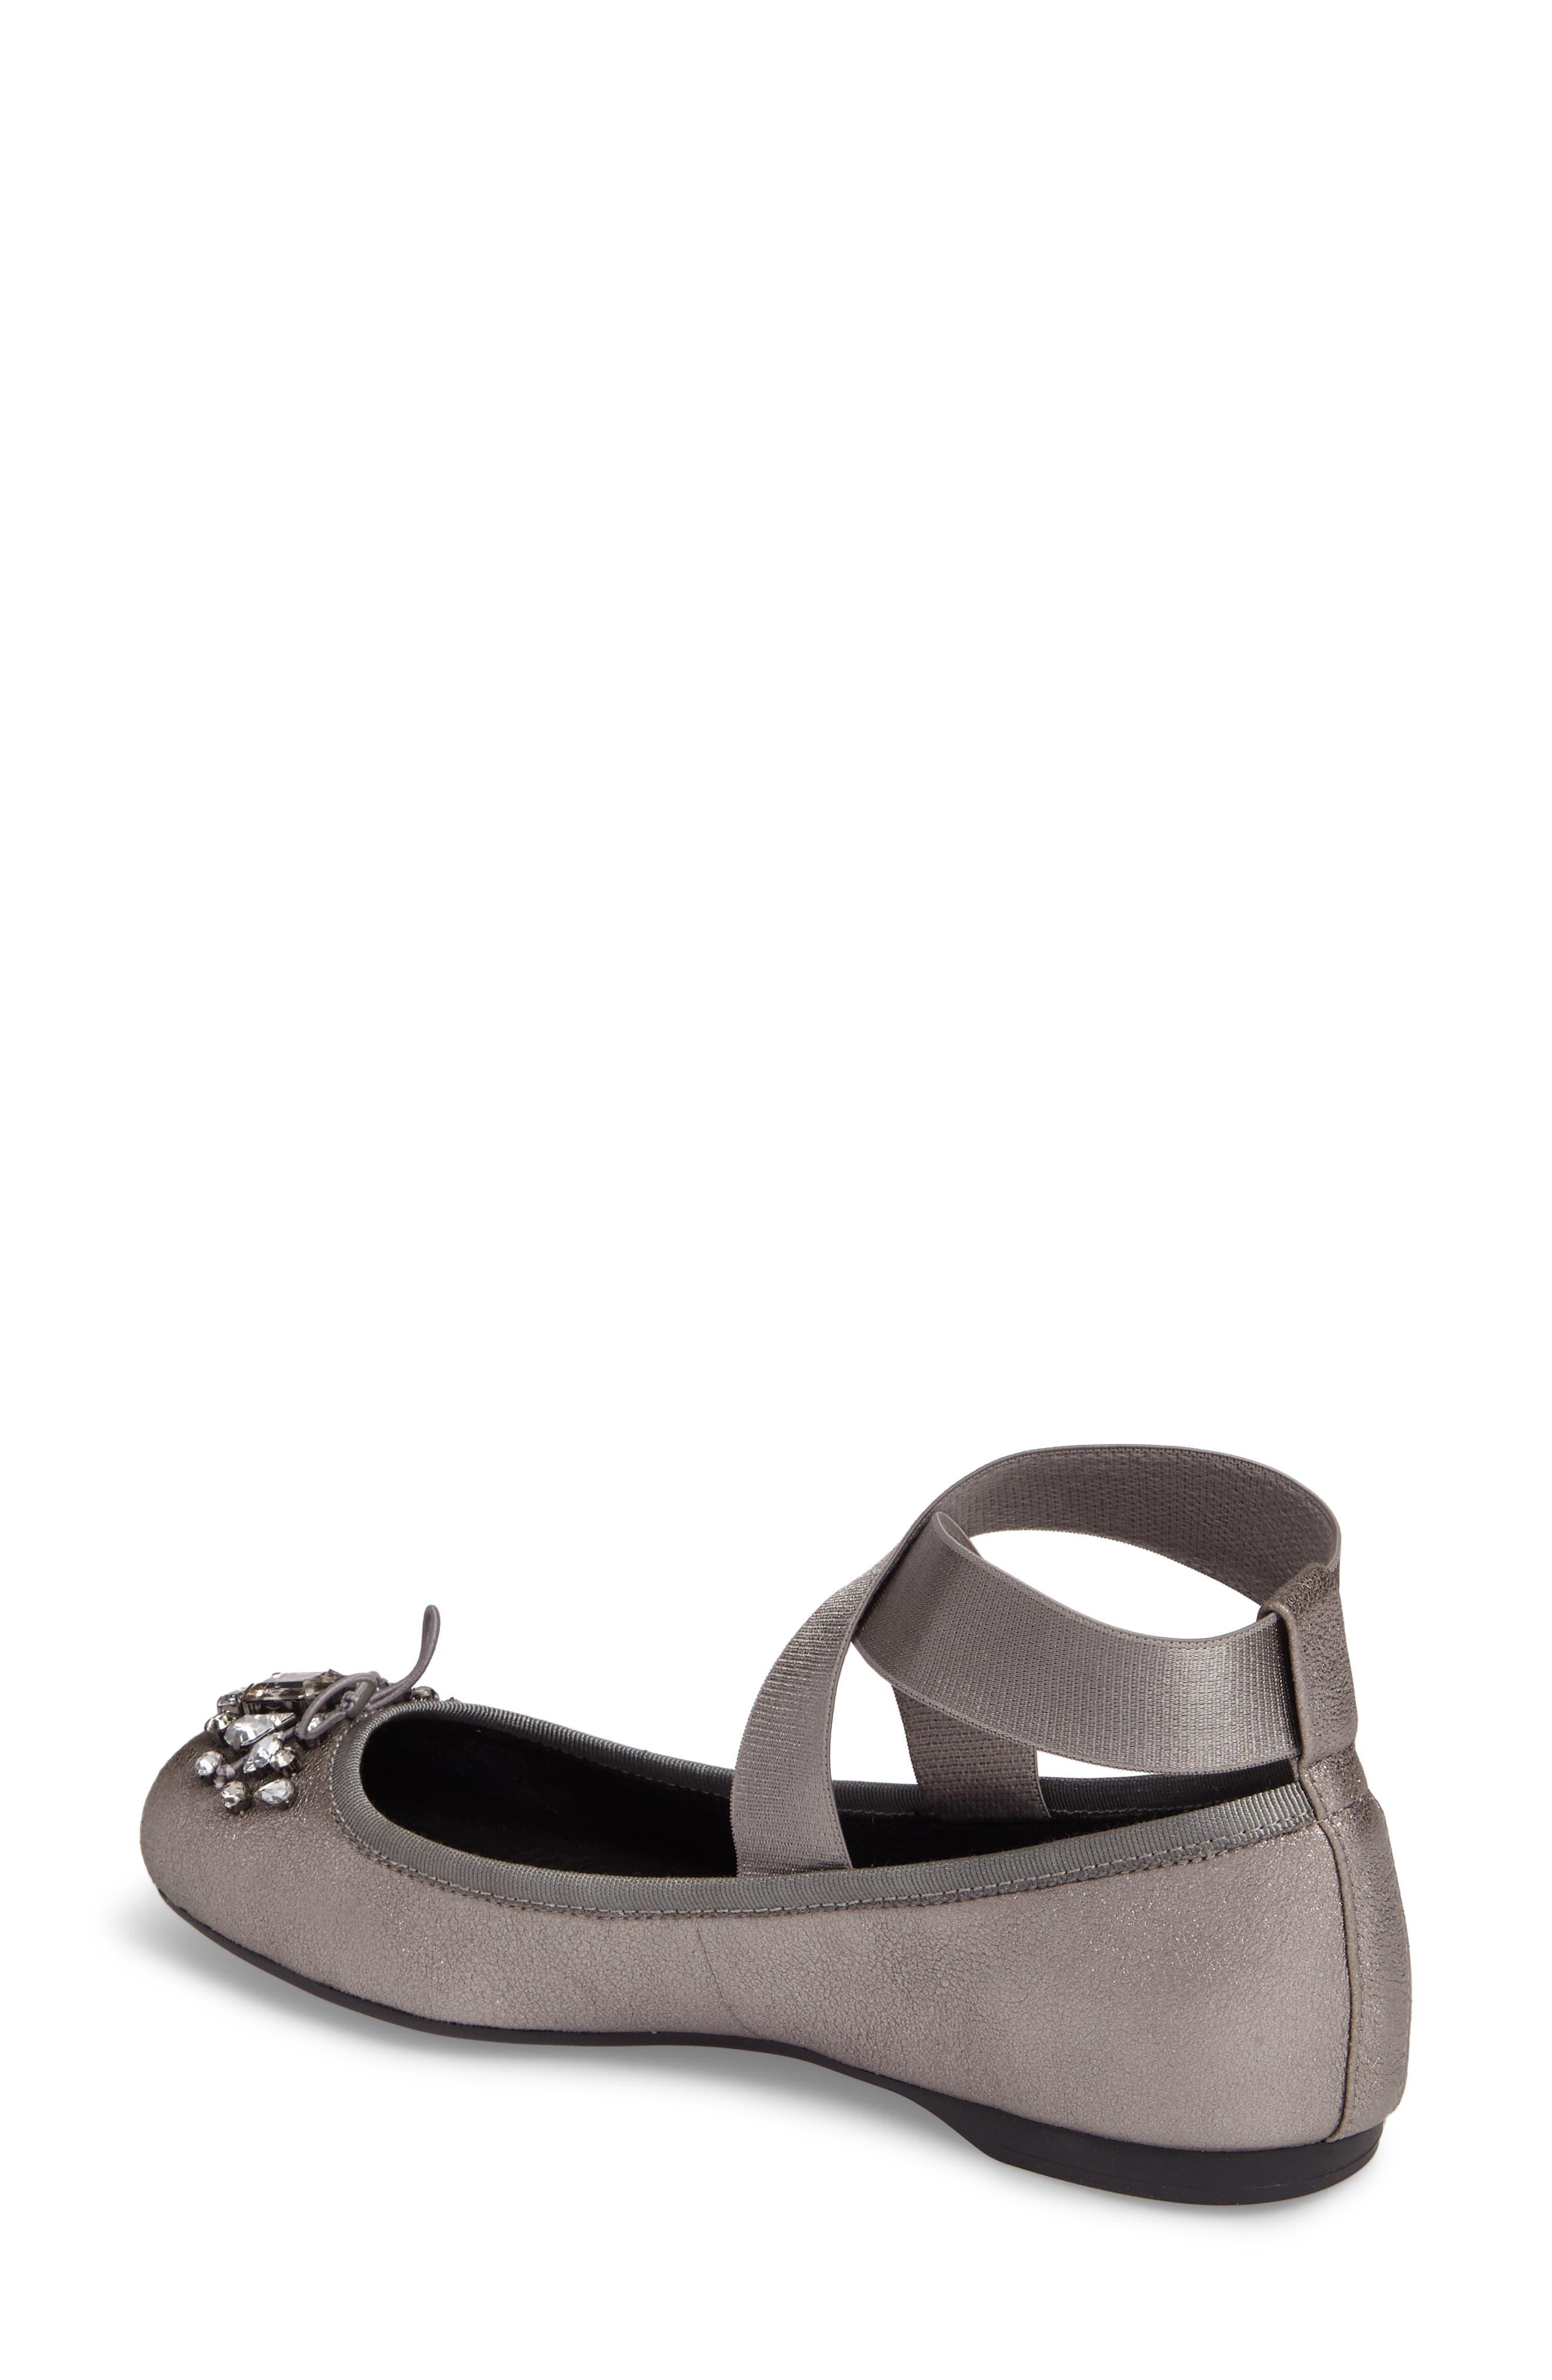 Alternate Image 2  - Jessica Simpson Miaha Embellished Blunt Toe Flat (Women)